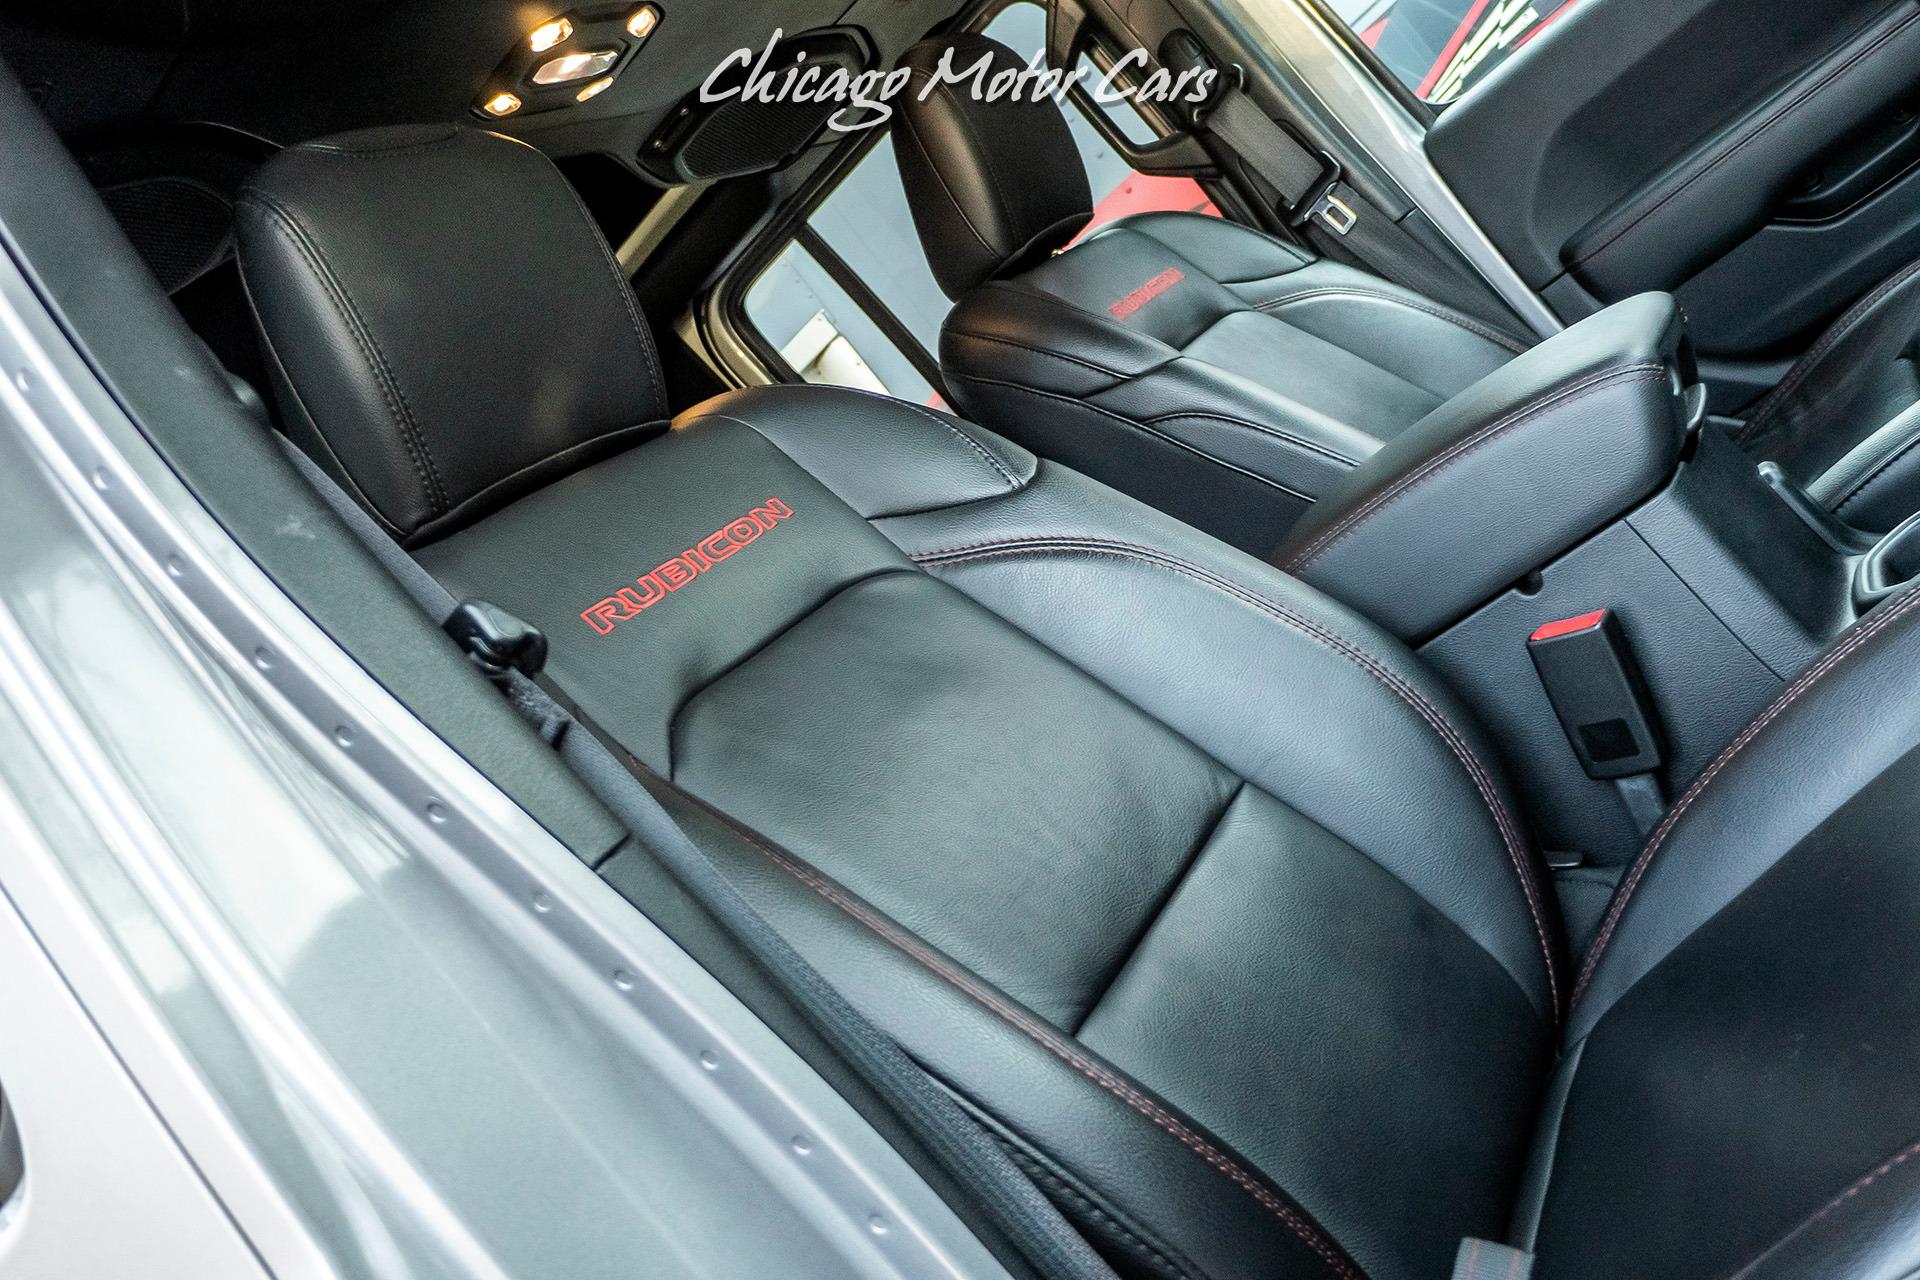 Used-2020-Jeep-Gladiator-Rubicon-64L-V8-Hemi-Conversion